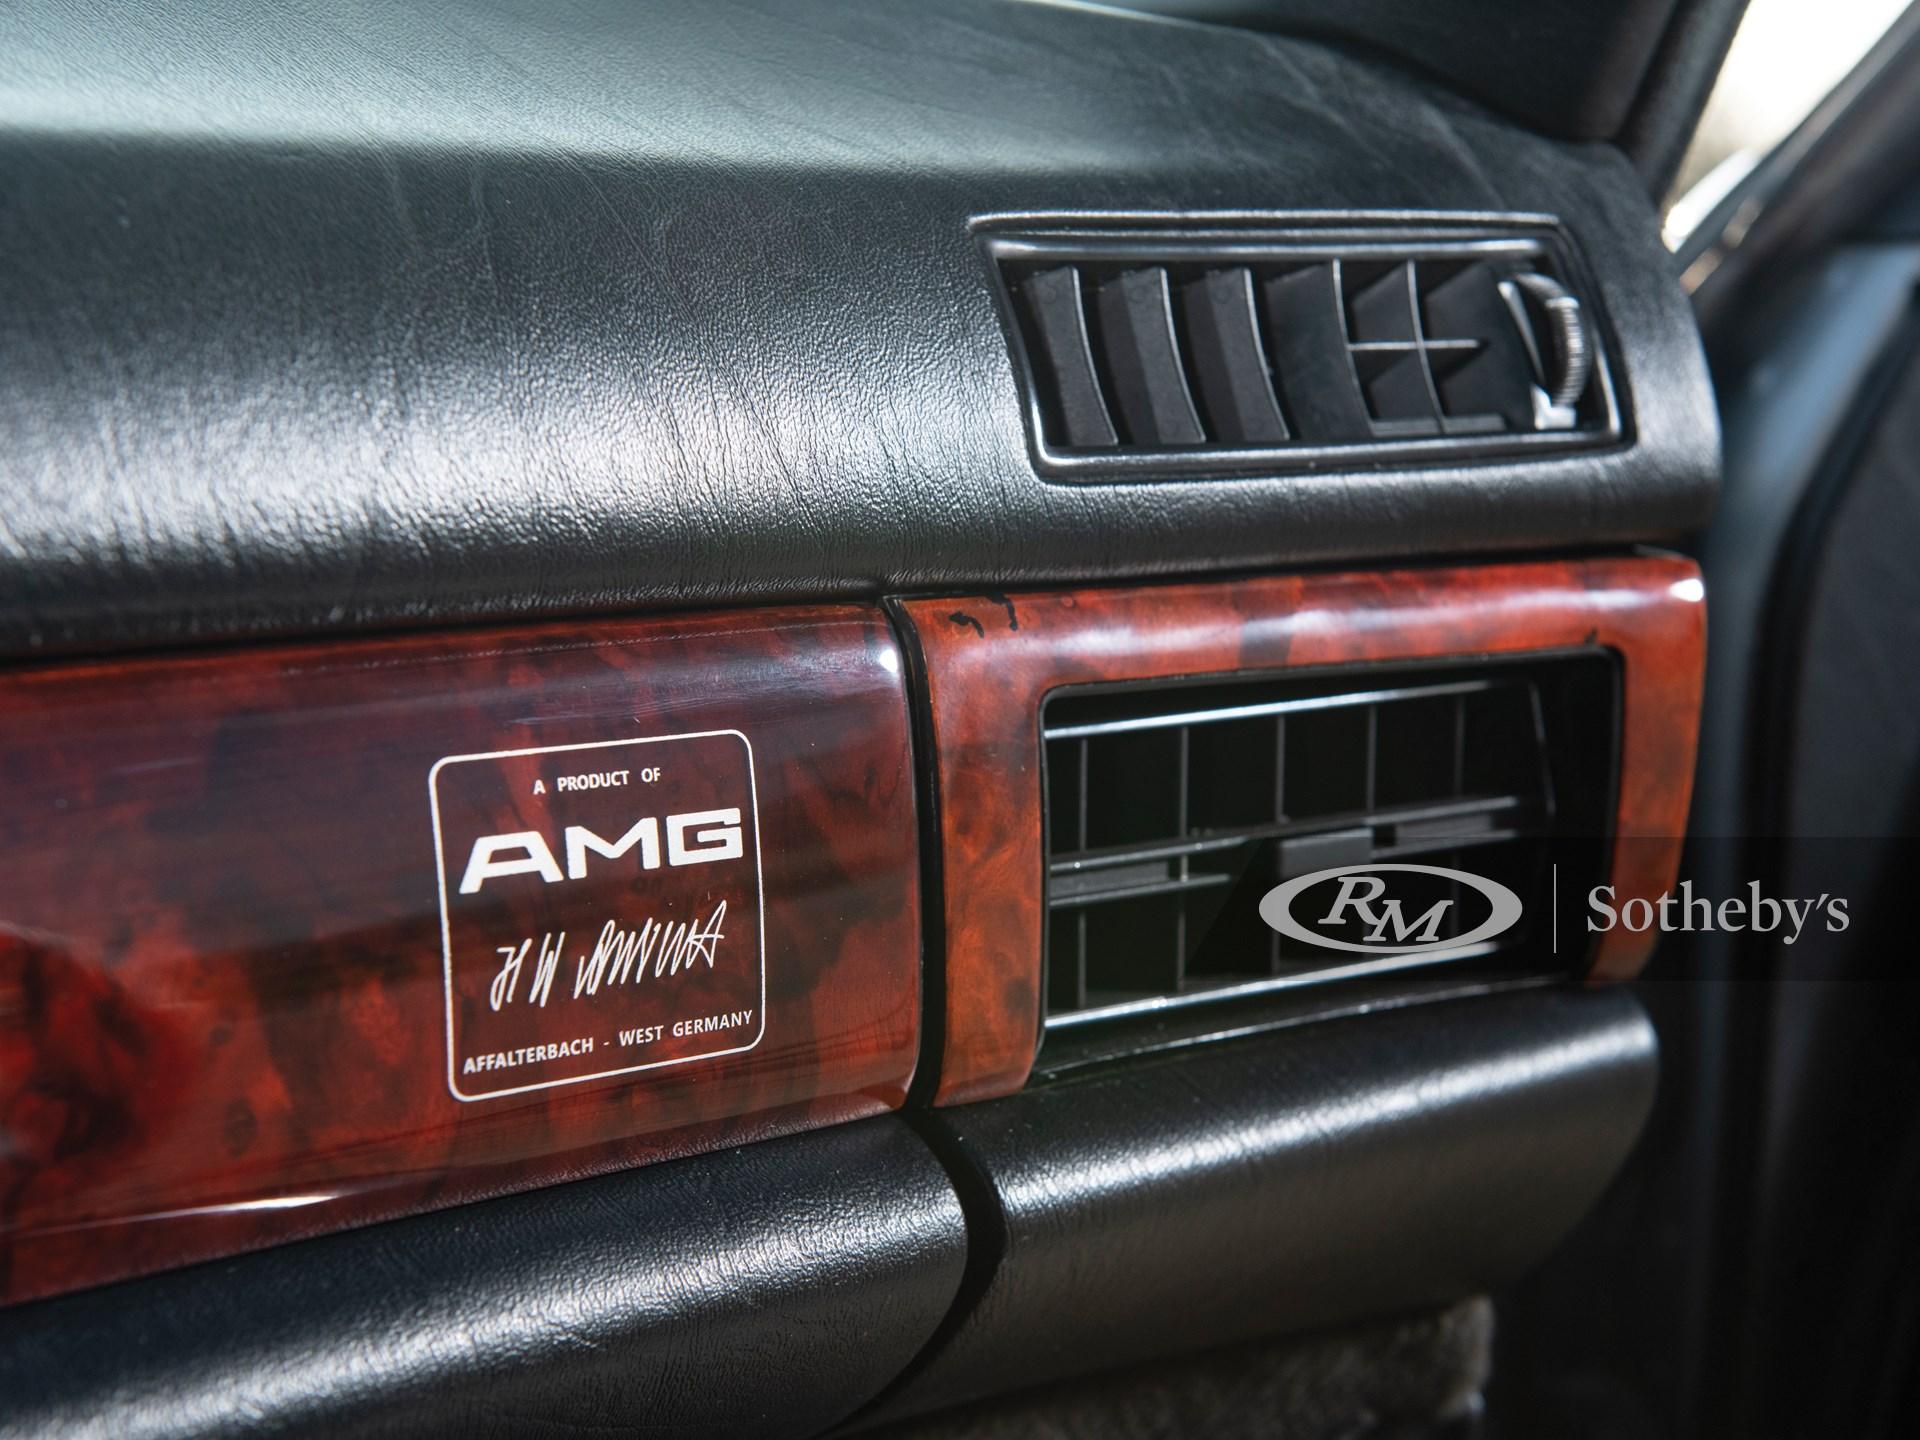 1989 Mercedes-Benz 560 SEL 6.0 AMG  -